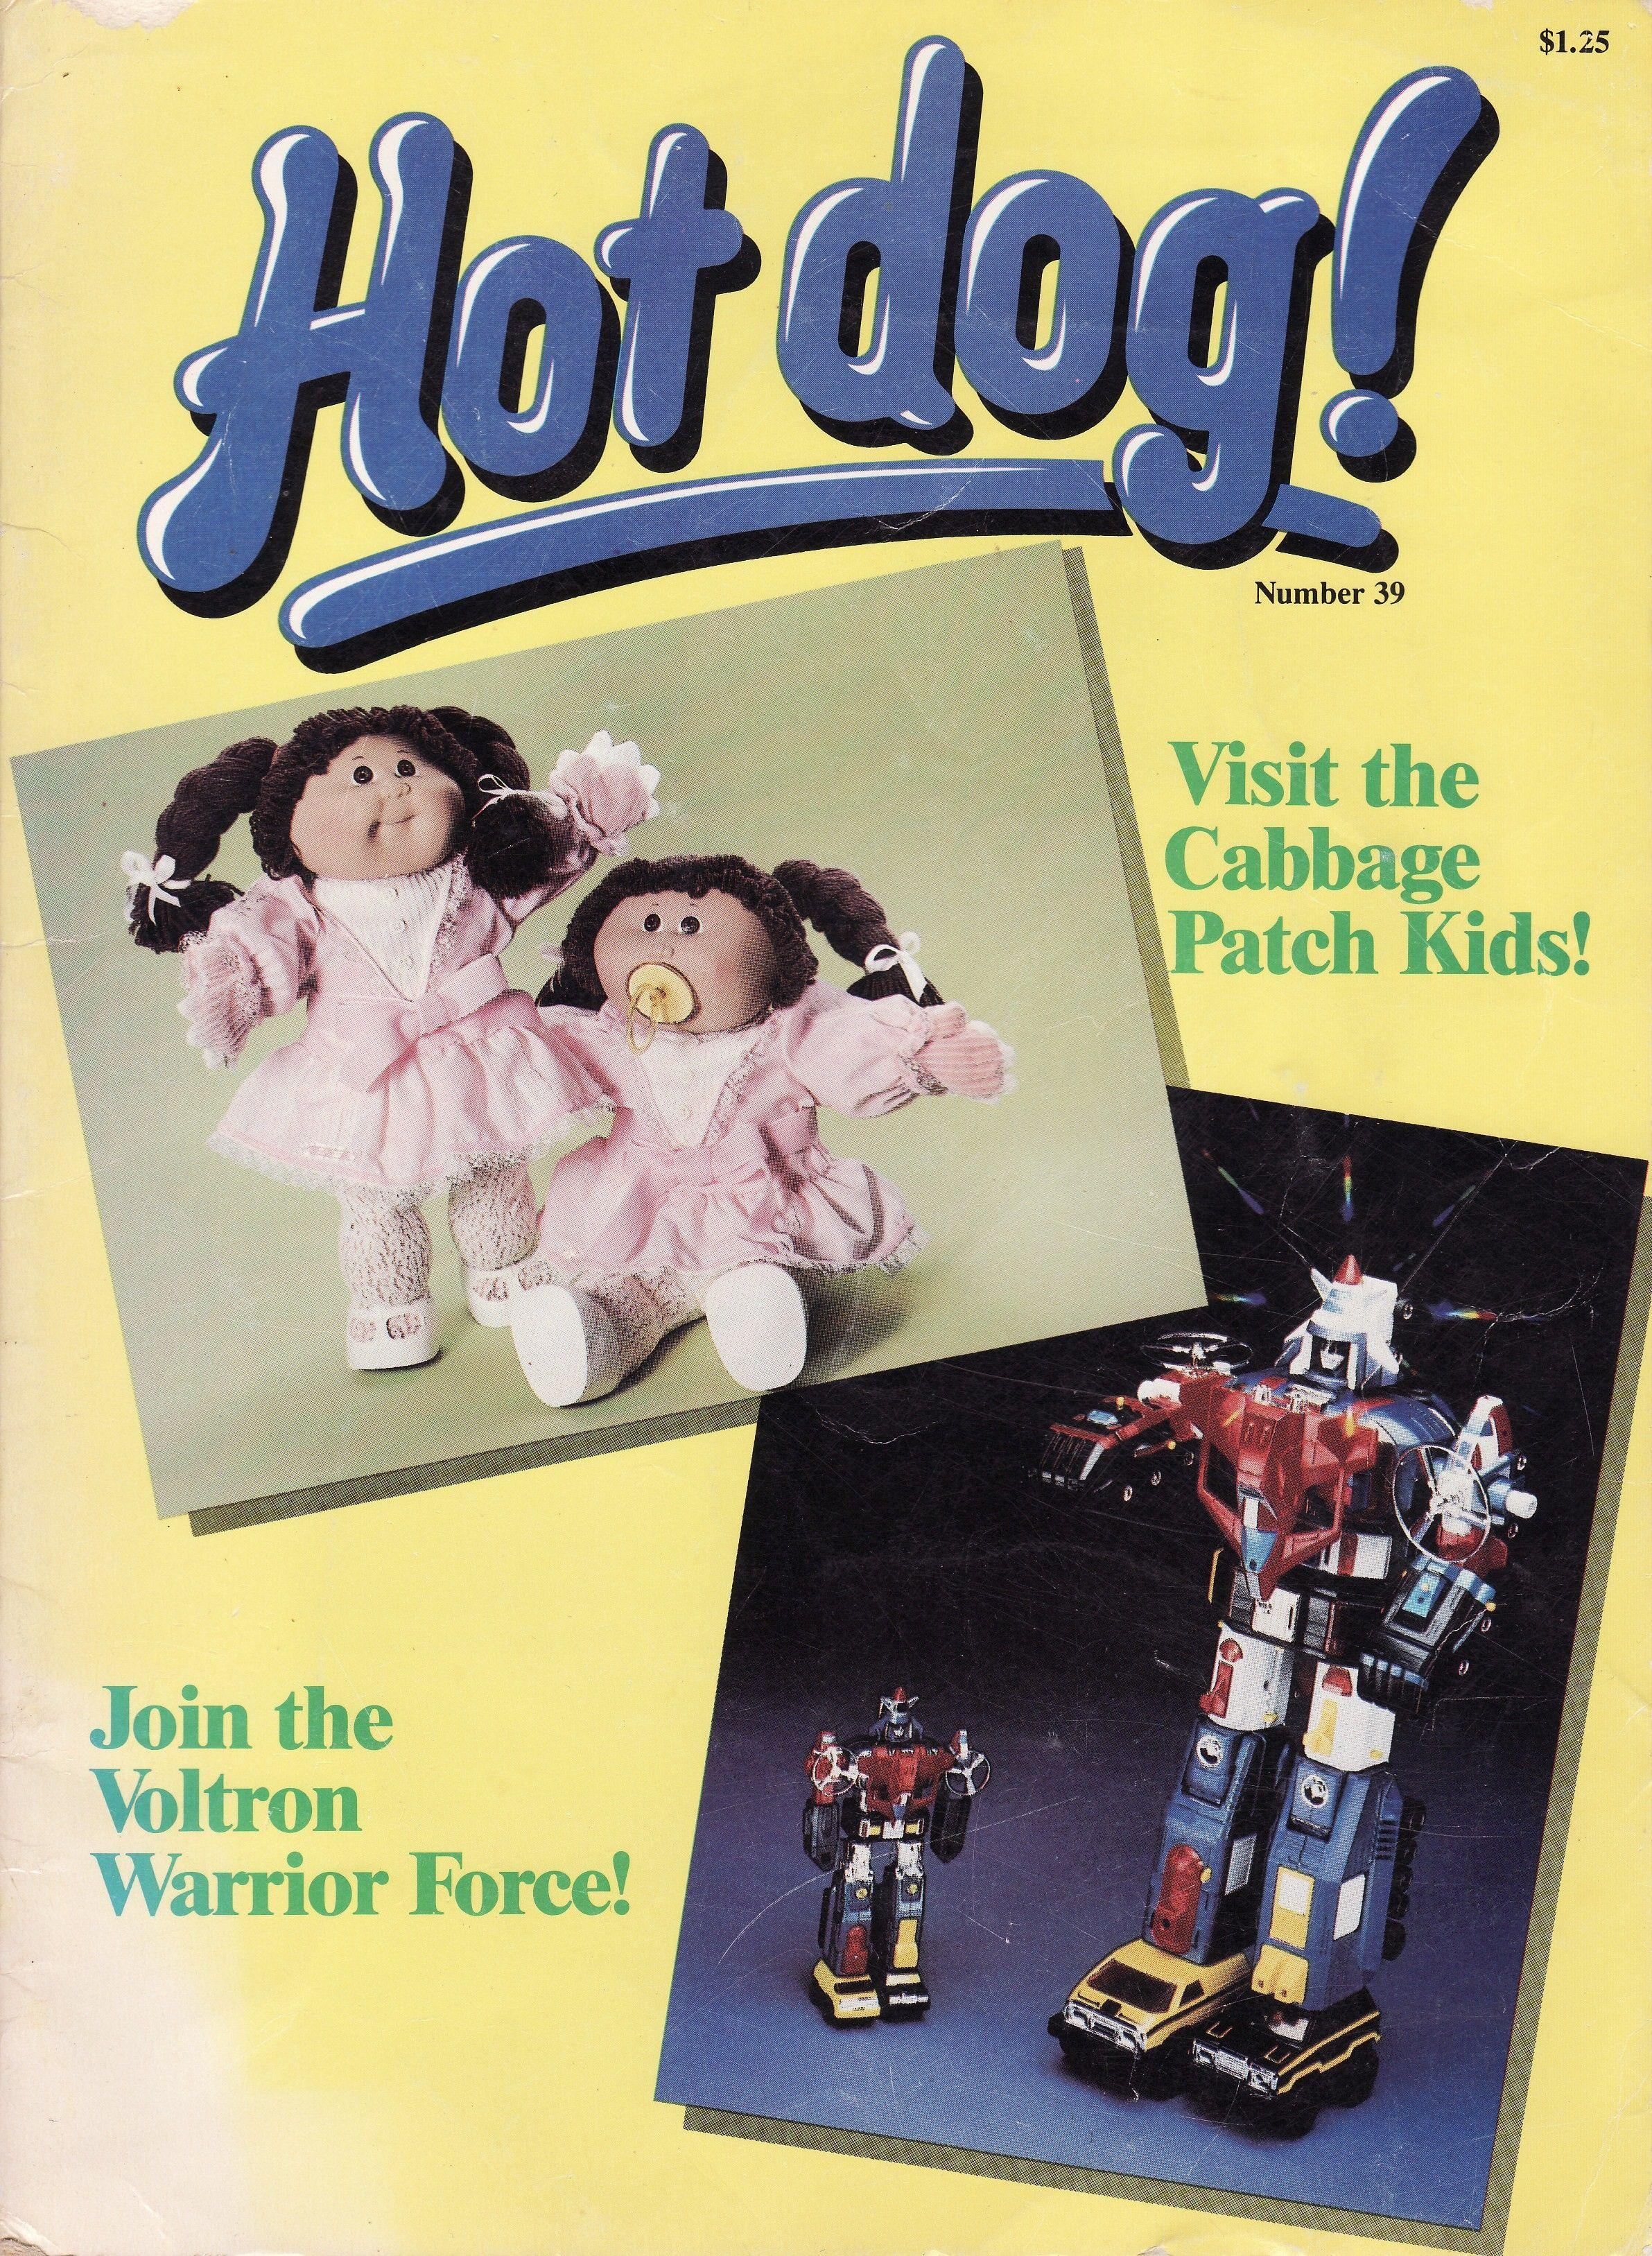 1986 Hot Dog Magazine Issue Cabbage Patch Kids Dog Magazine Kids